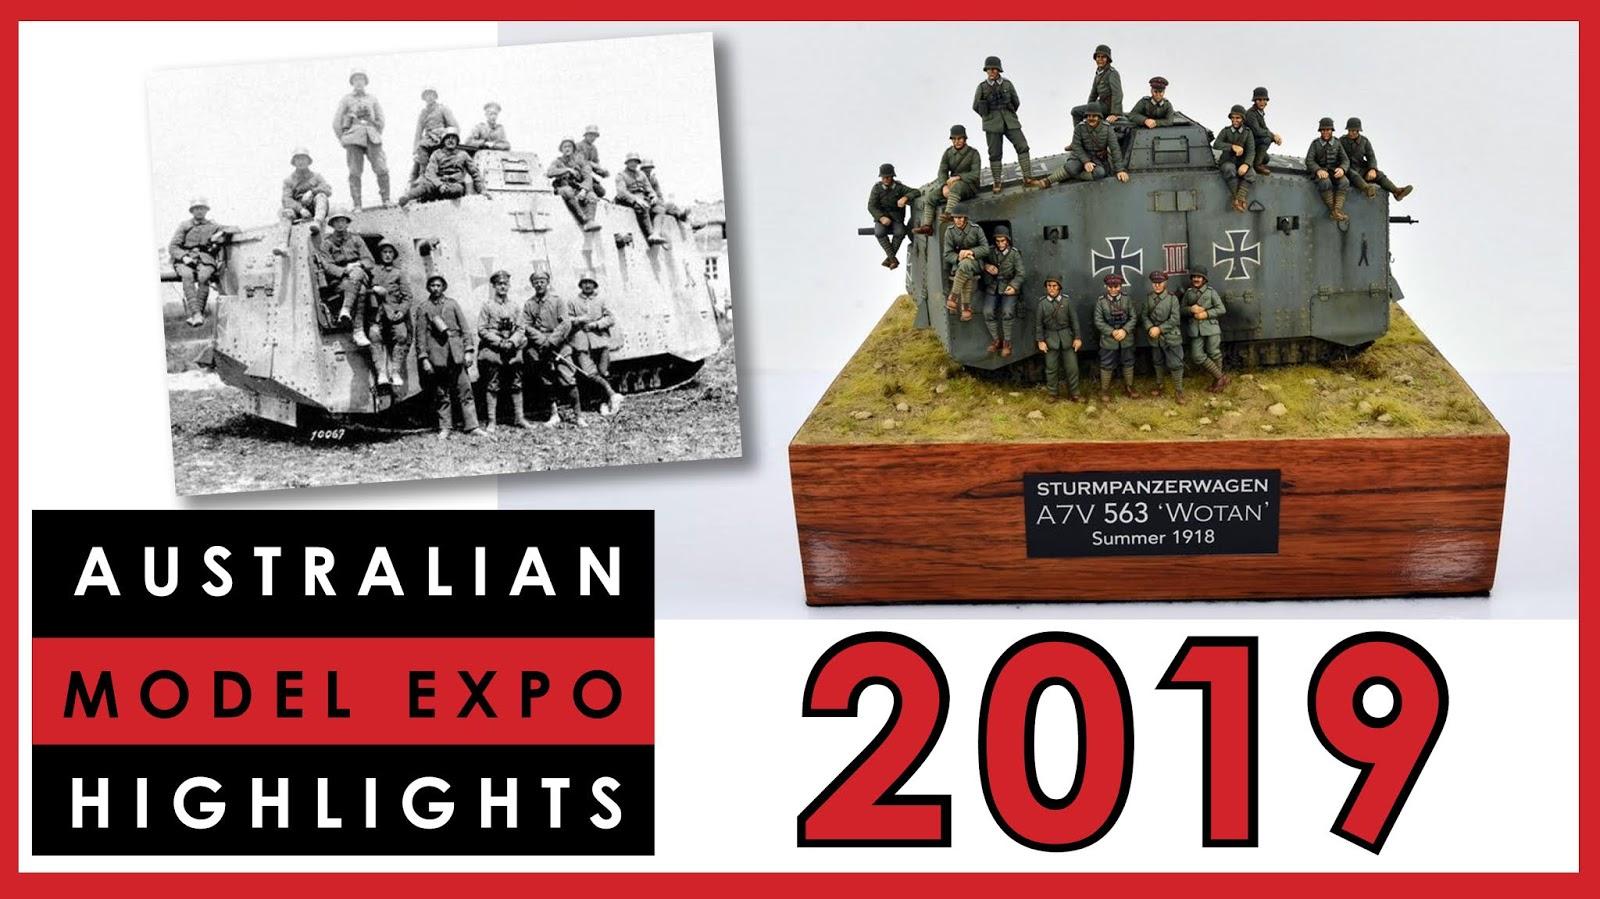 Best Years Expo 2019 Dave's Model Workshop: New video: Australian Model Expo 2019